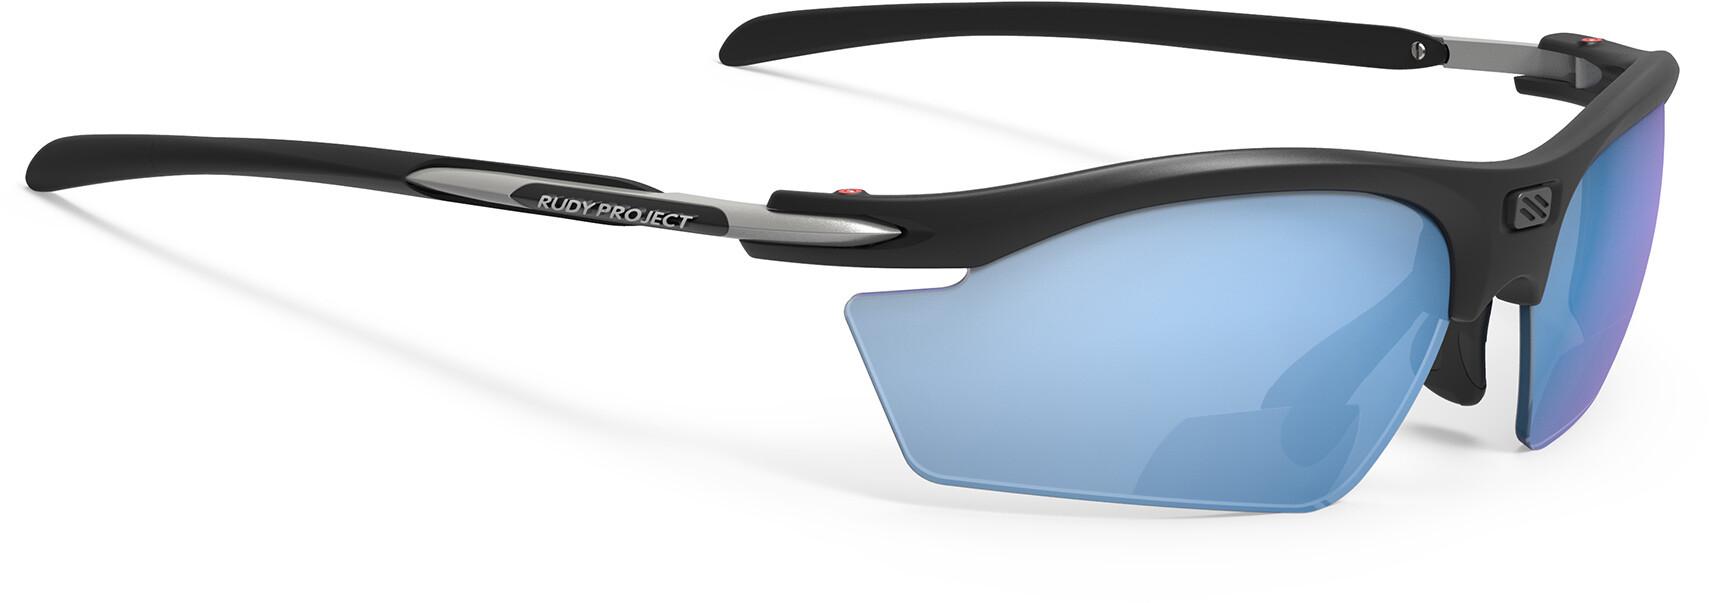 Rudy Project Rydon Readers +2.0 dpt Cykelbriller, matte black / multilaser ice | Briller